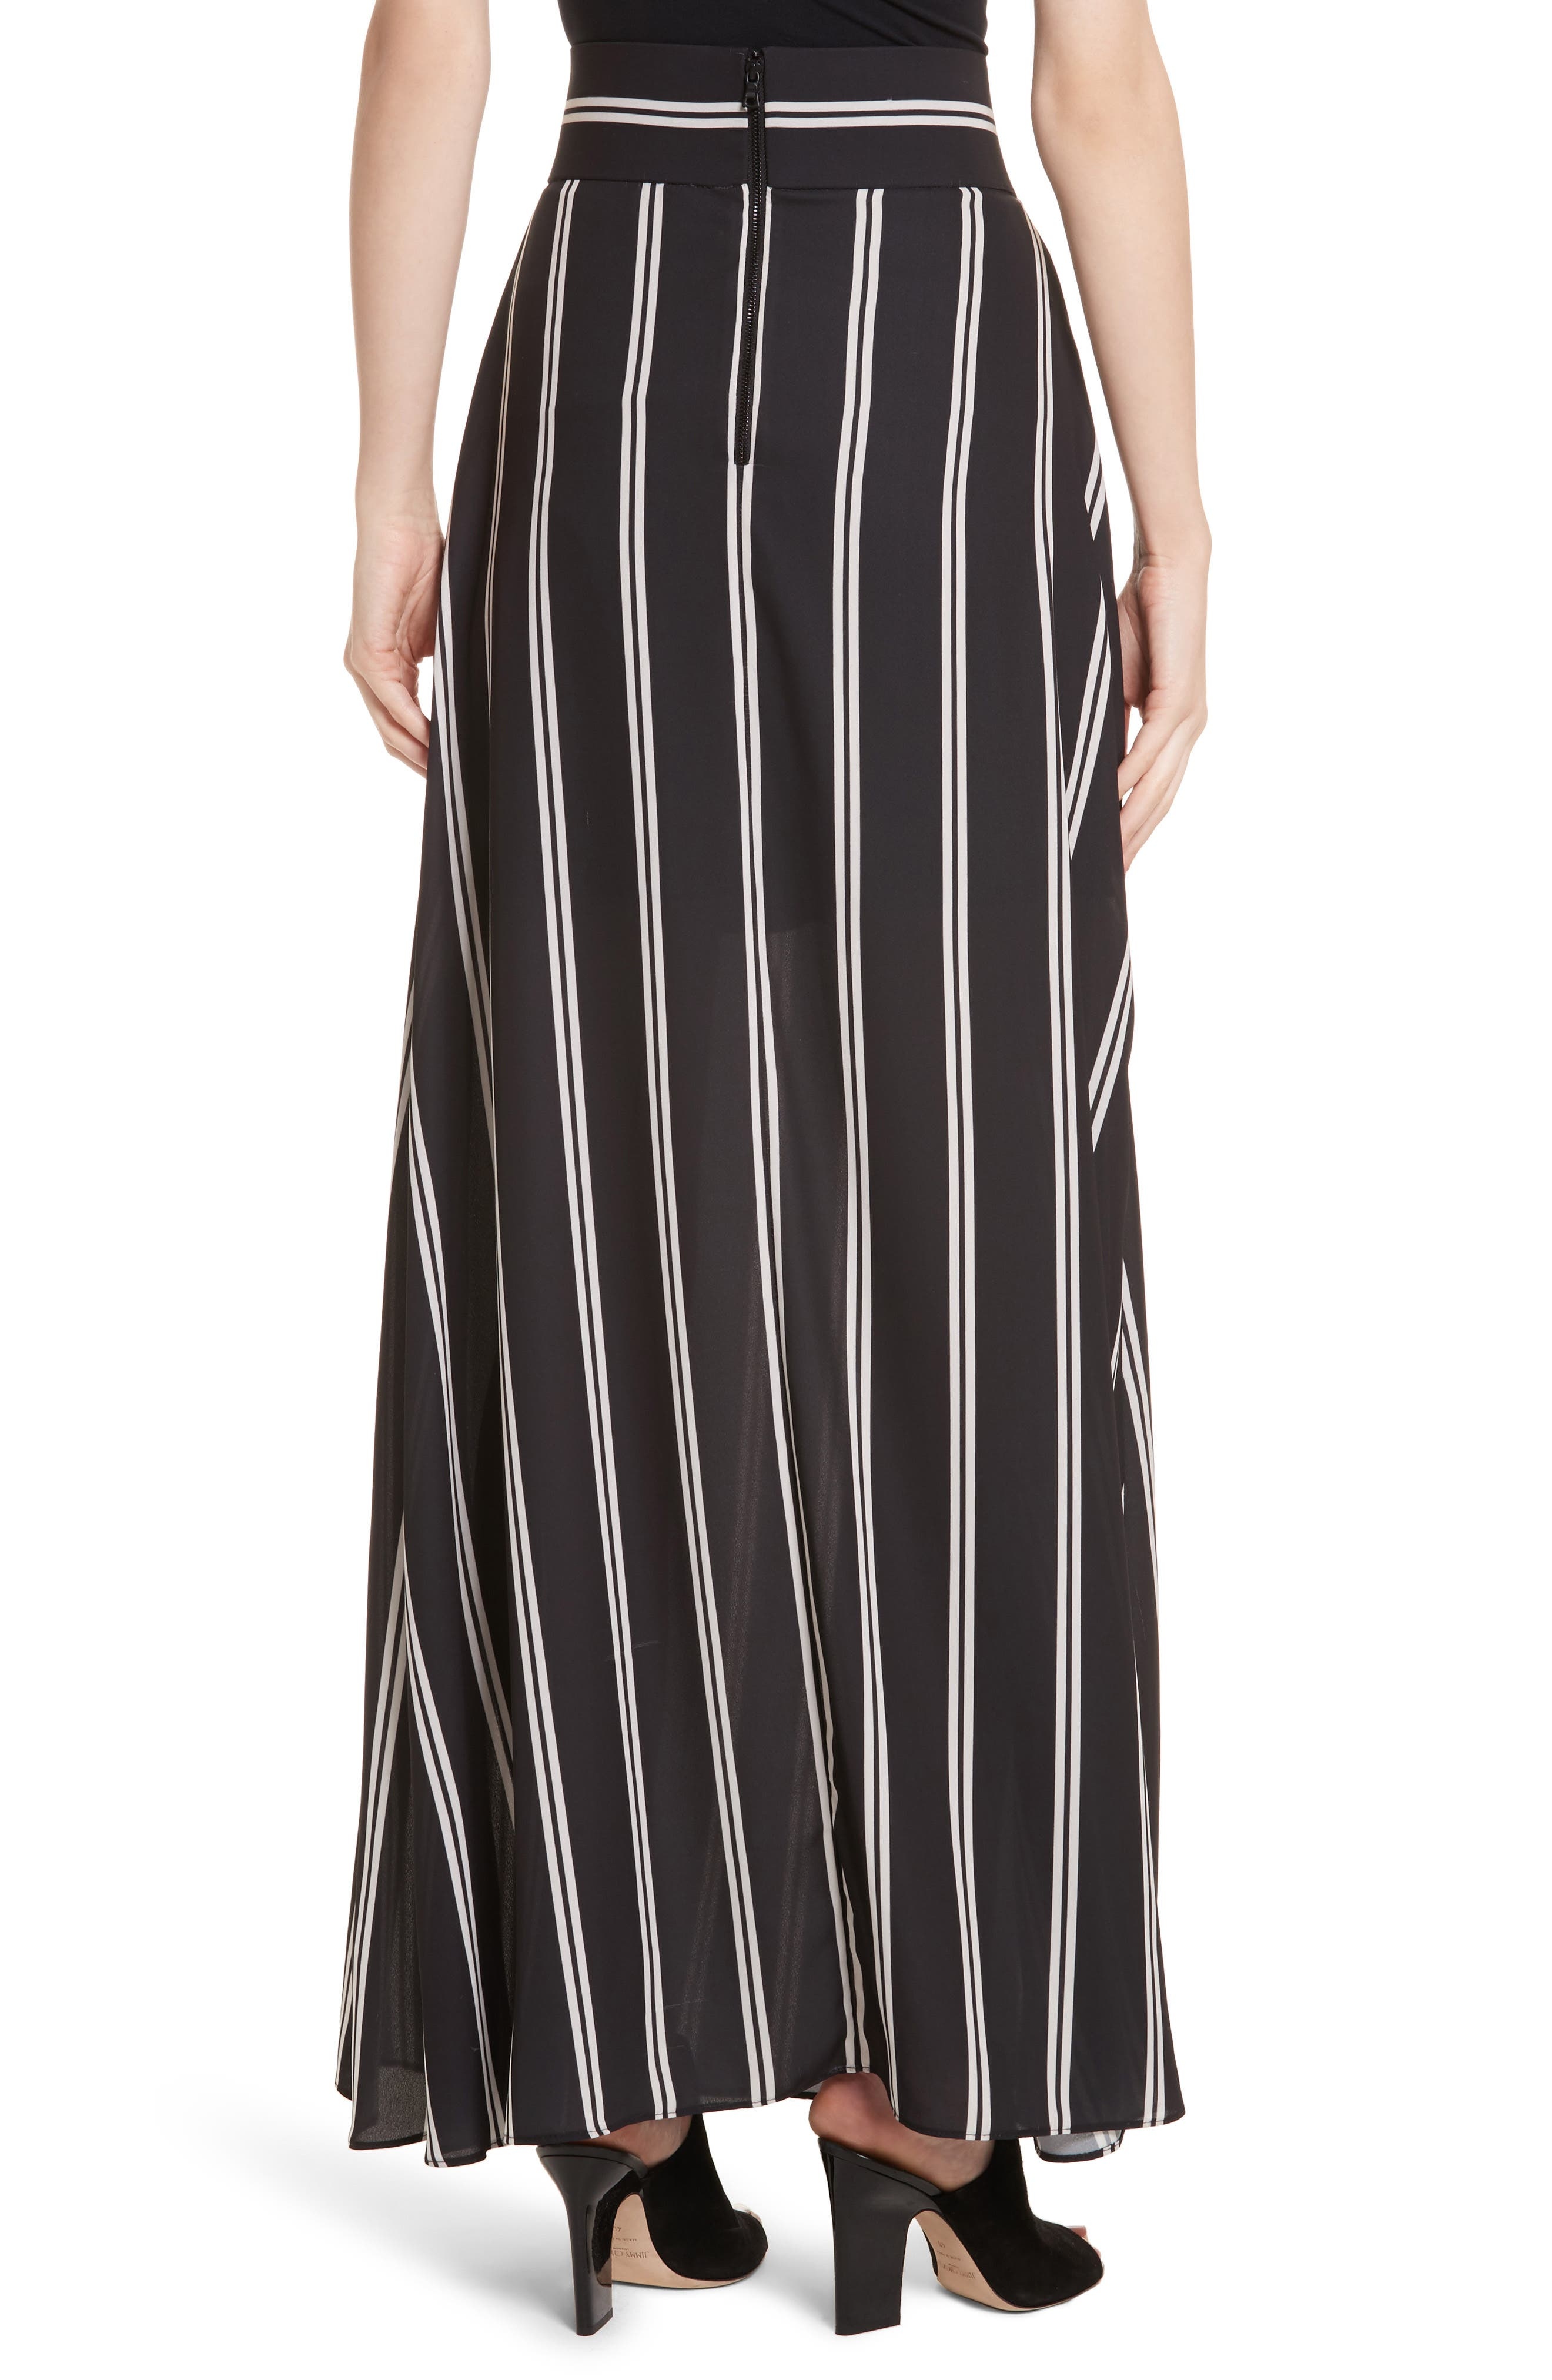 Gabel Clean Pleat Maxi Skirt,                             Alternate thumbnail 2, color,                             002